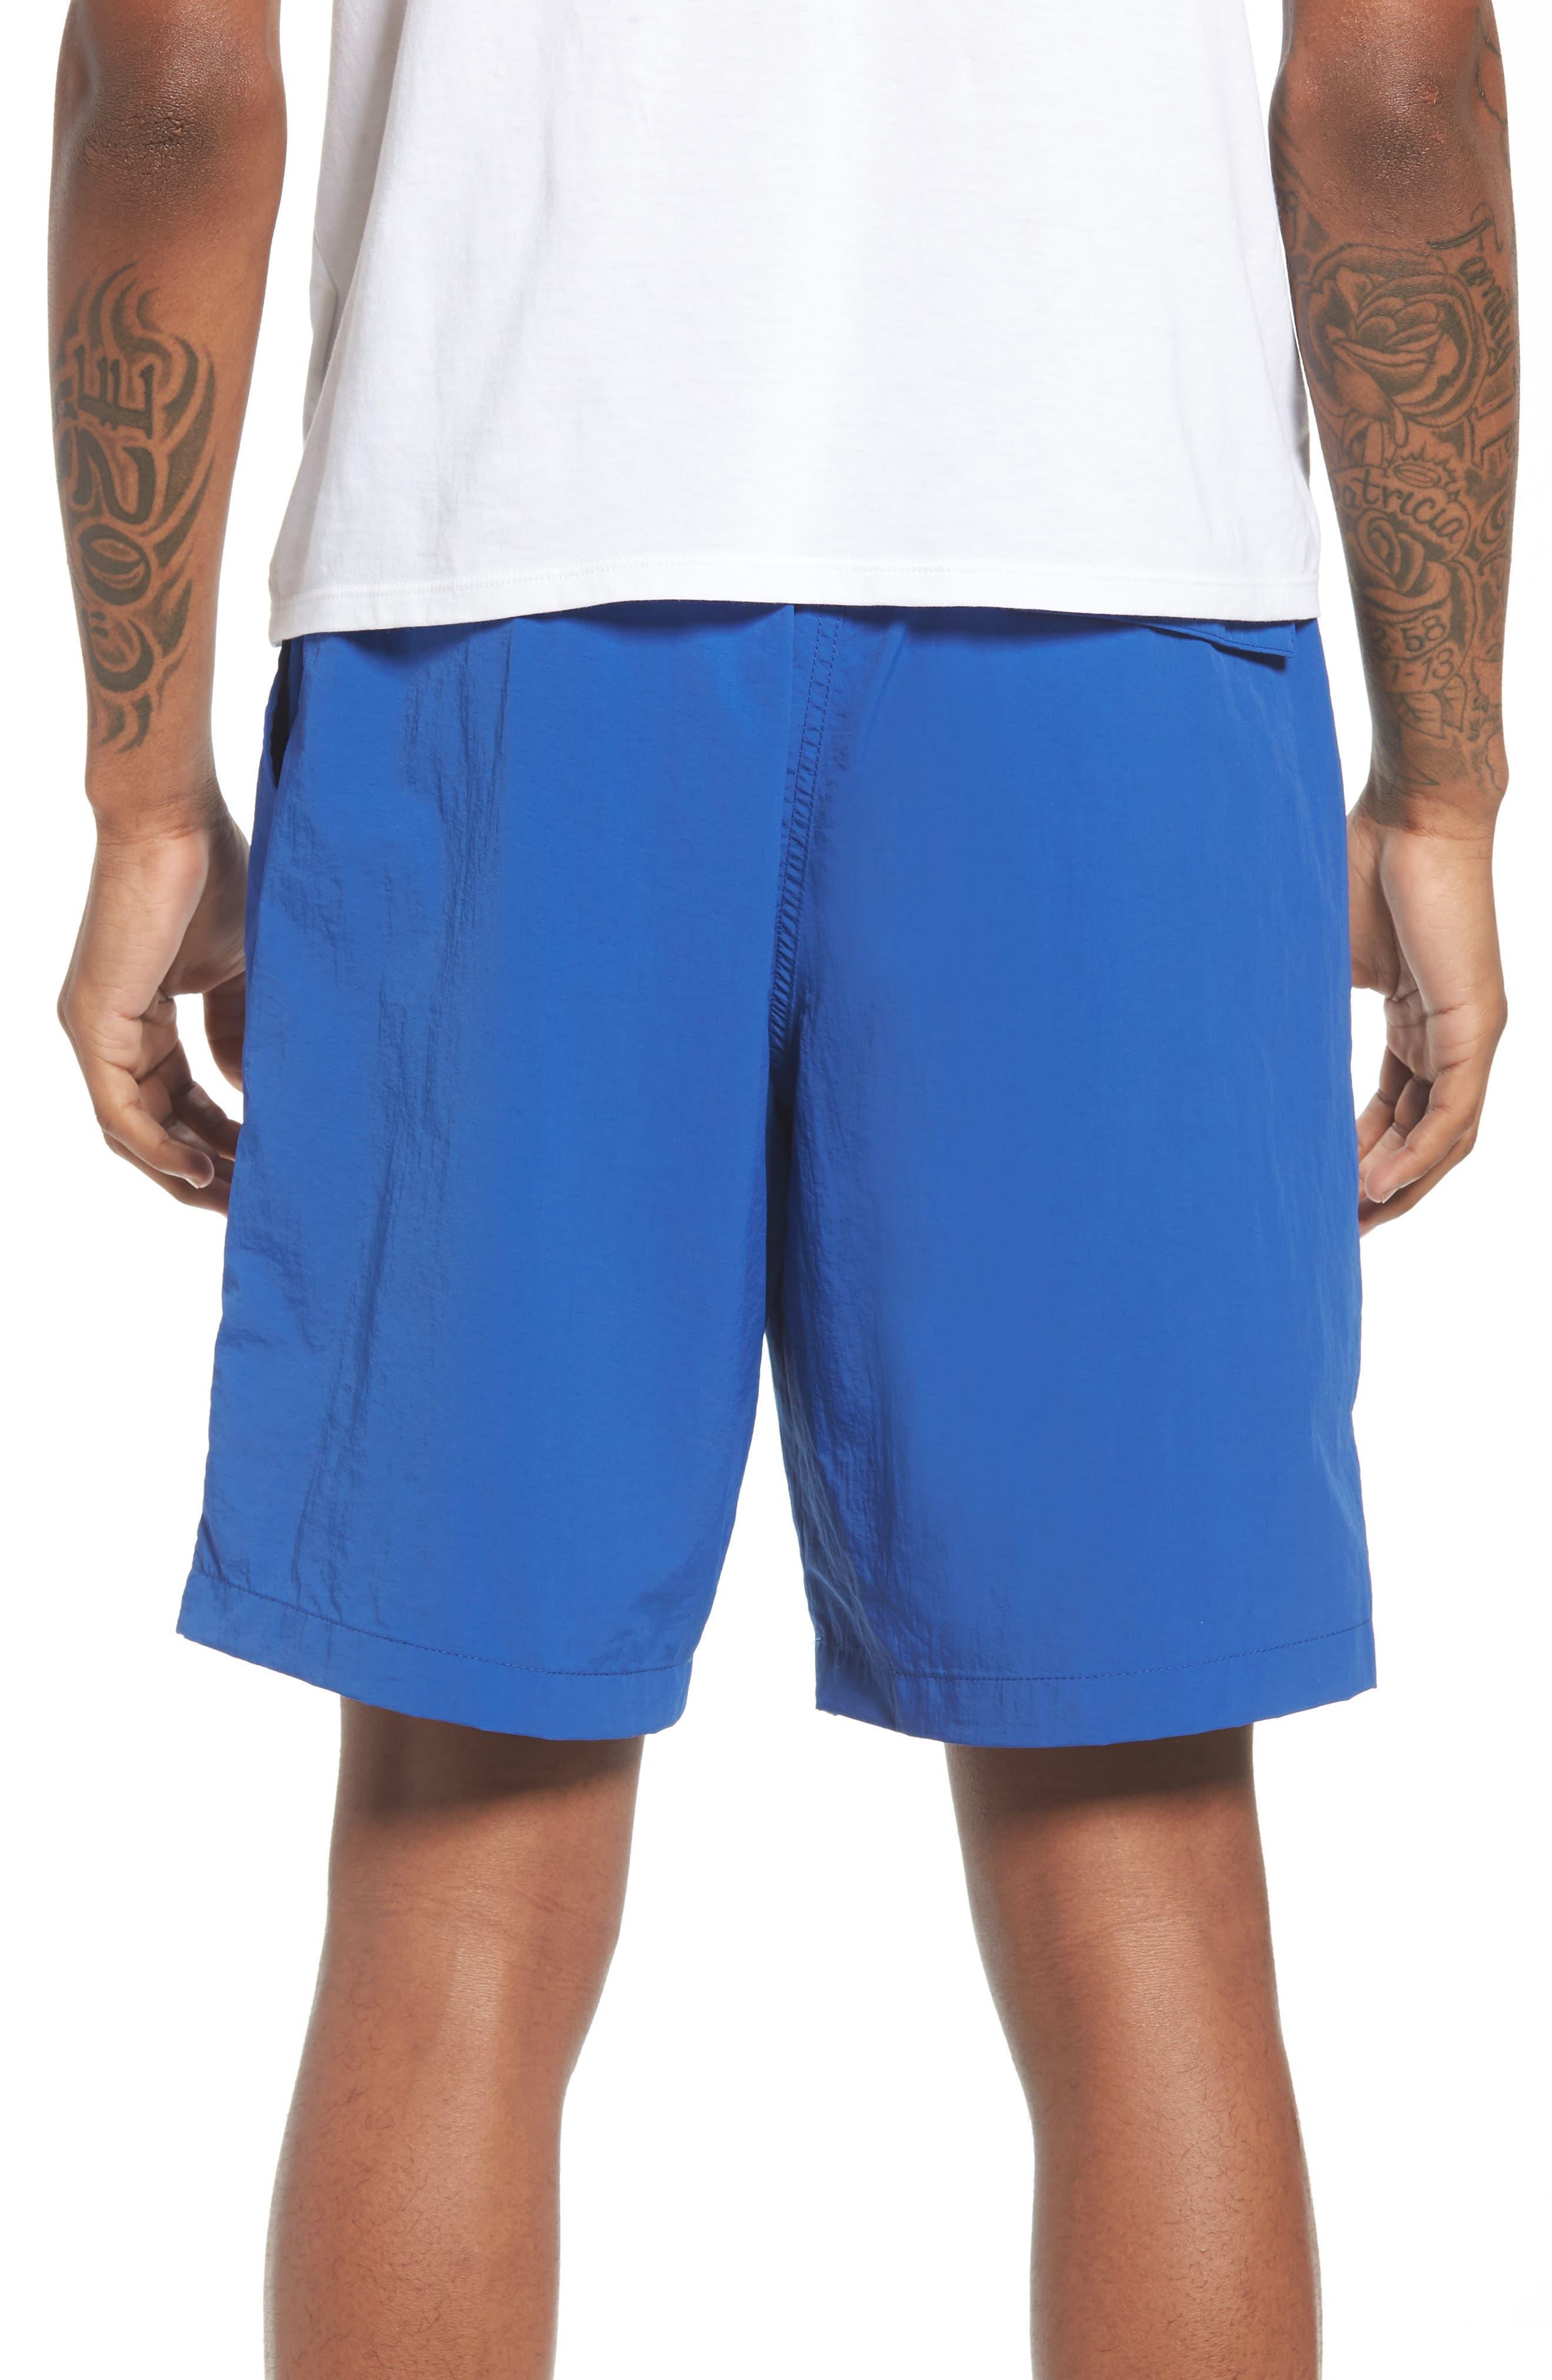 Mondy Shorts,                             Alternate thumbnail 8, color,